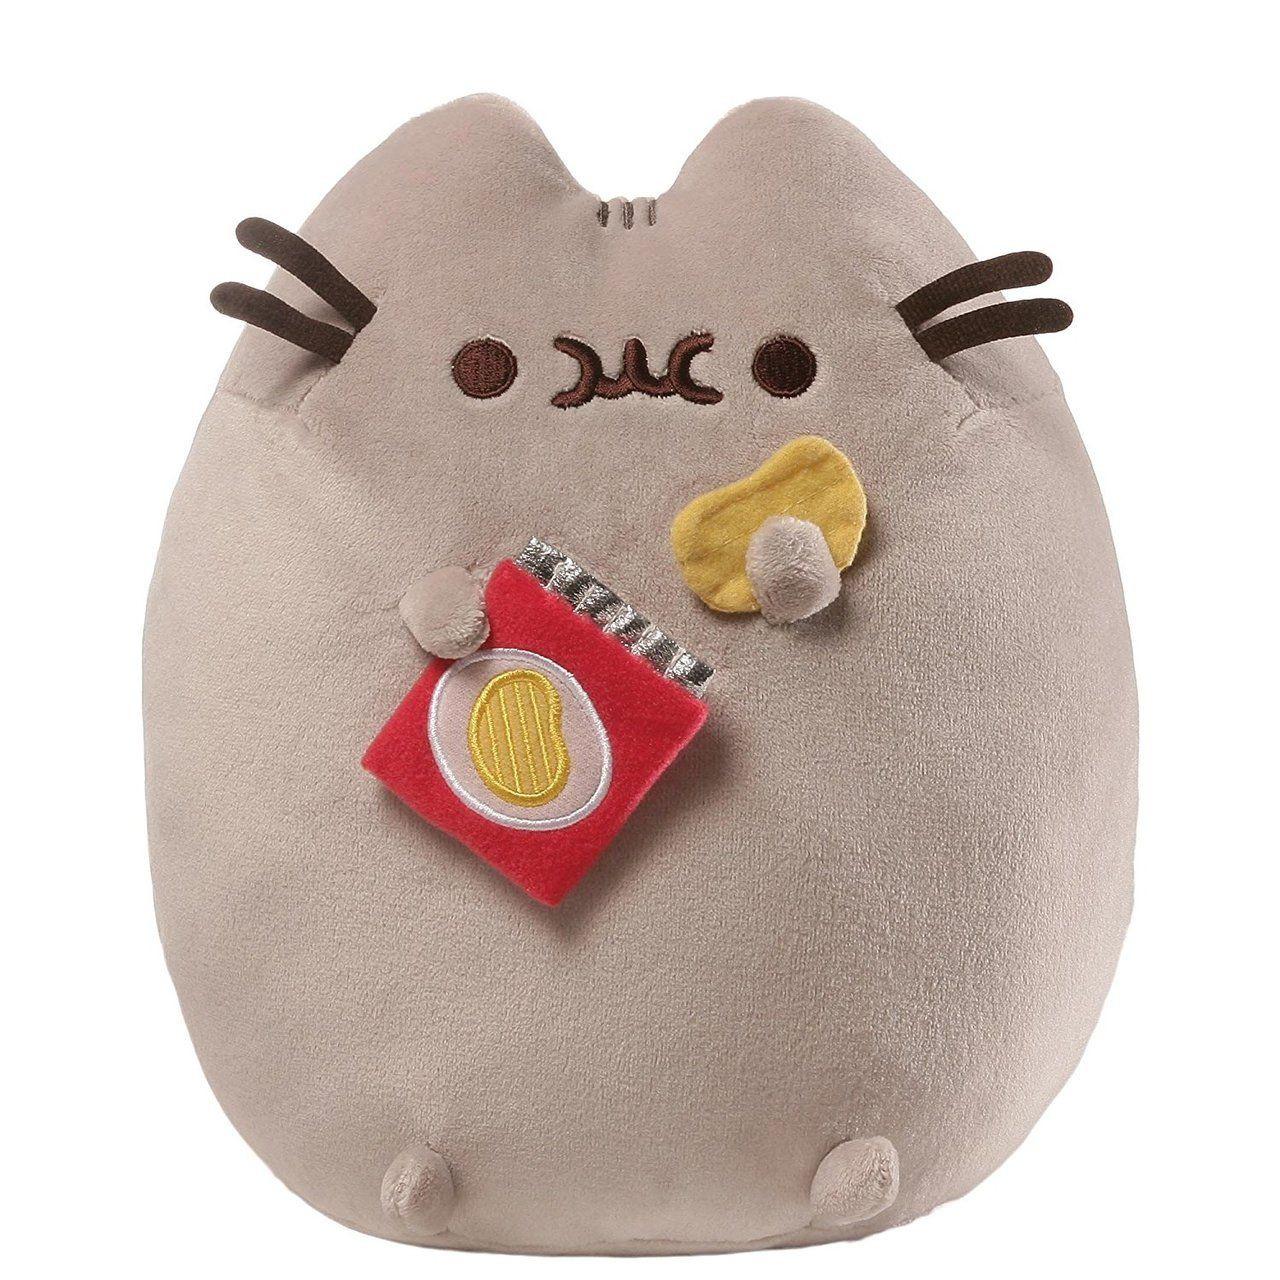 b81aa12c6e4 GUND Pusheen Stuffed Animal Plush Cat with Potato Chips